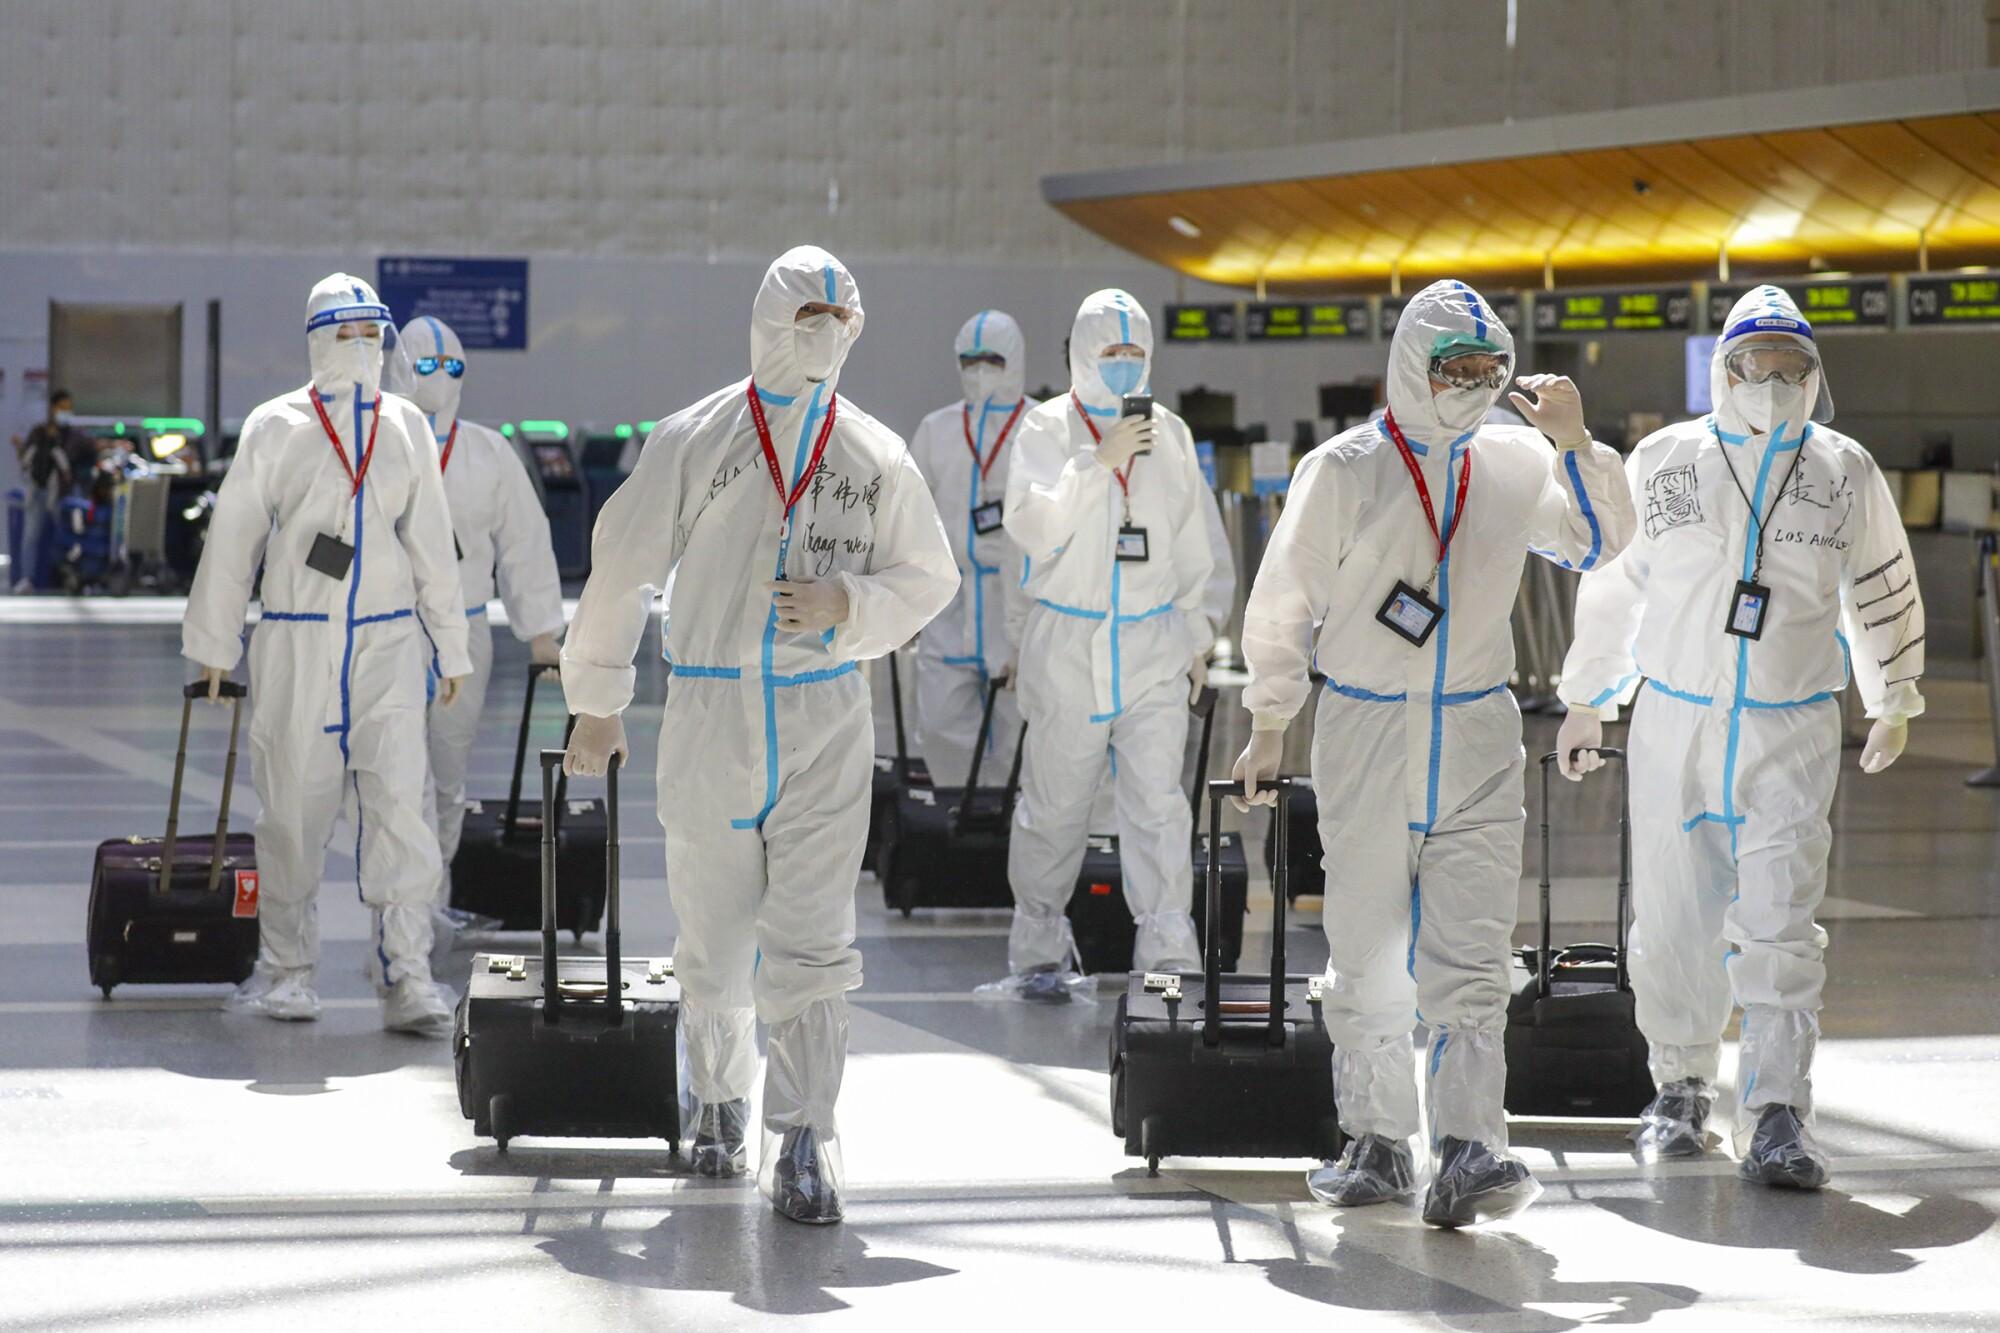 A flight crew in full biohazard suits at Tom Bradley Terminal.